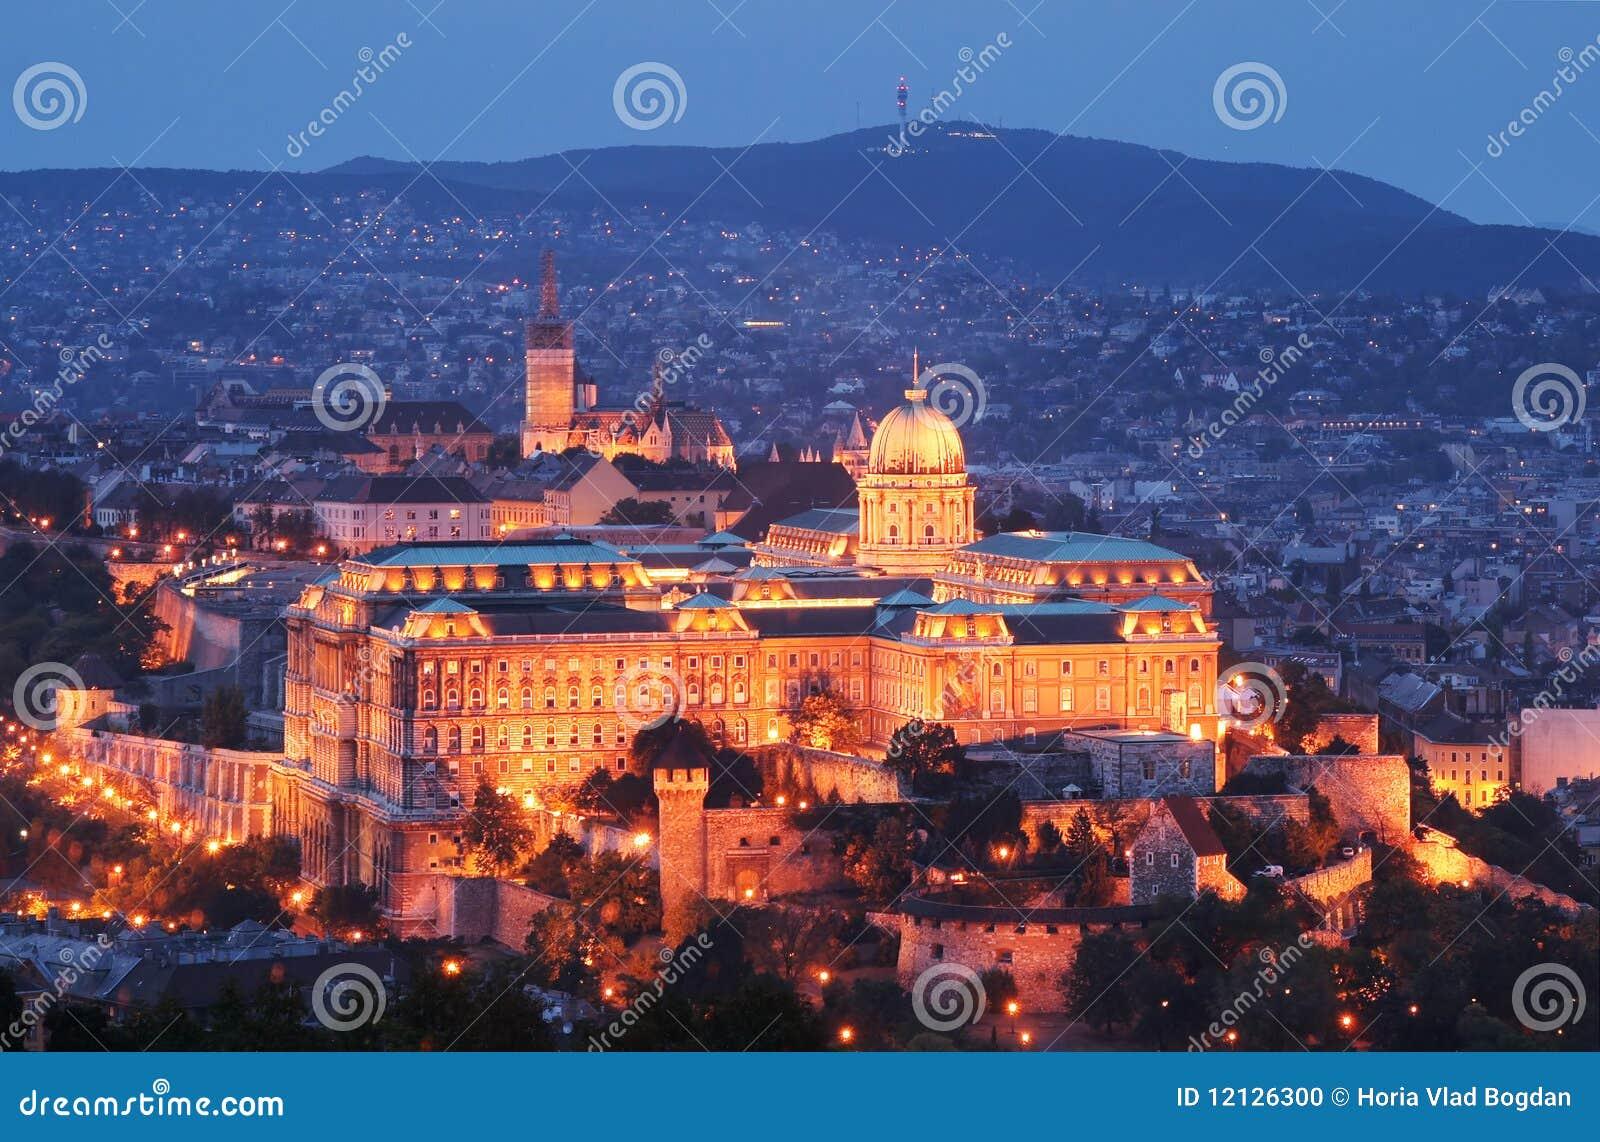 Castillo por noche - Budapest, Hungría de Buda